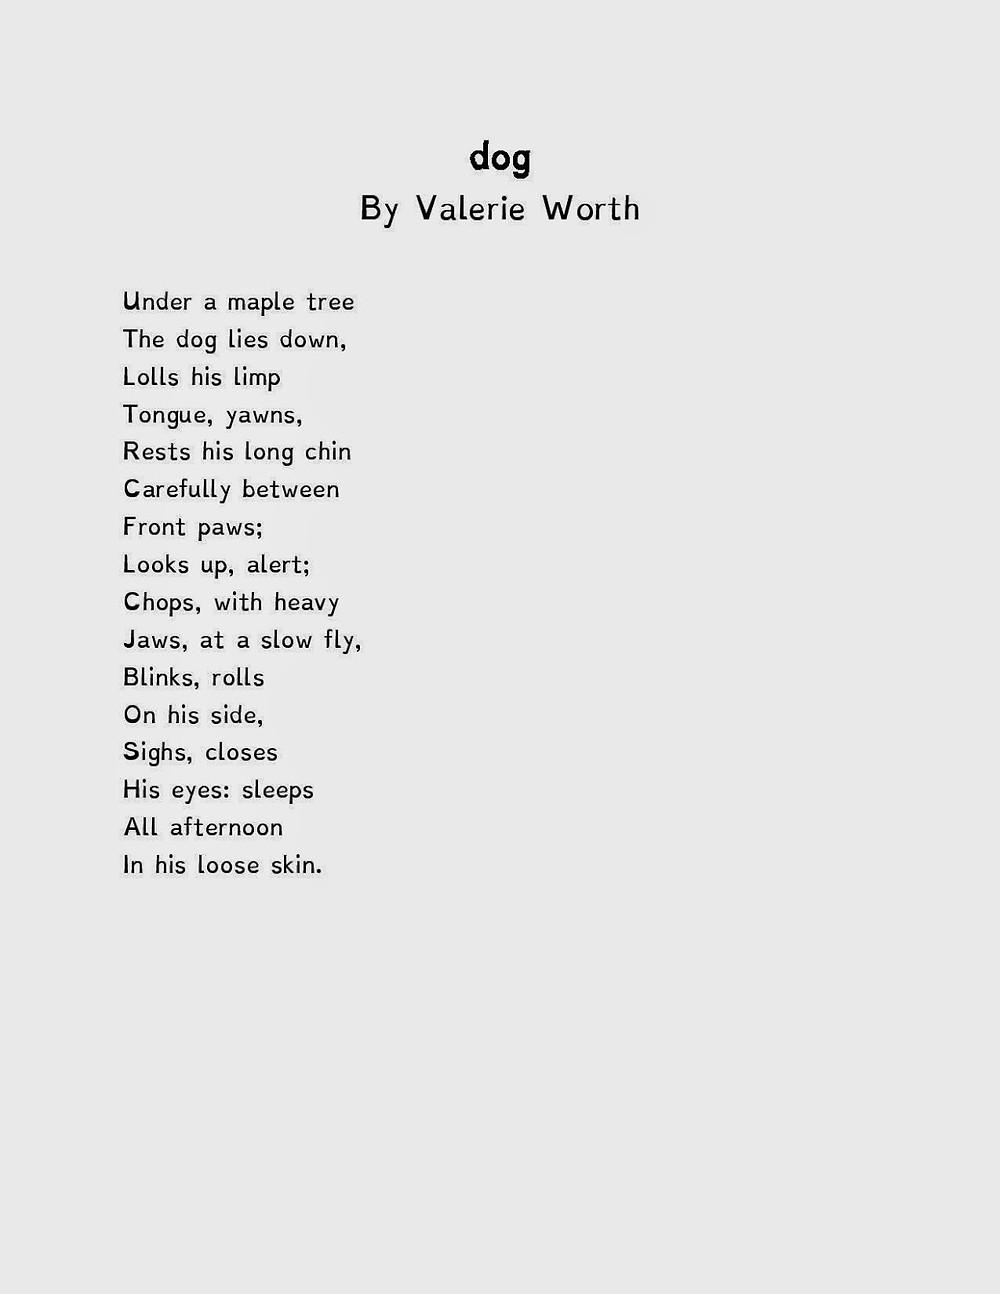 dog-page-001.jpg